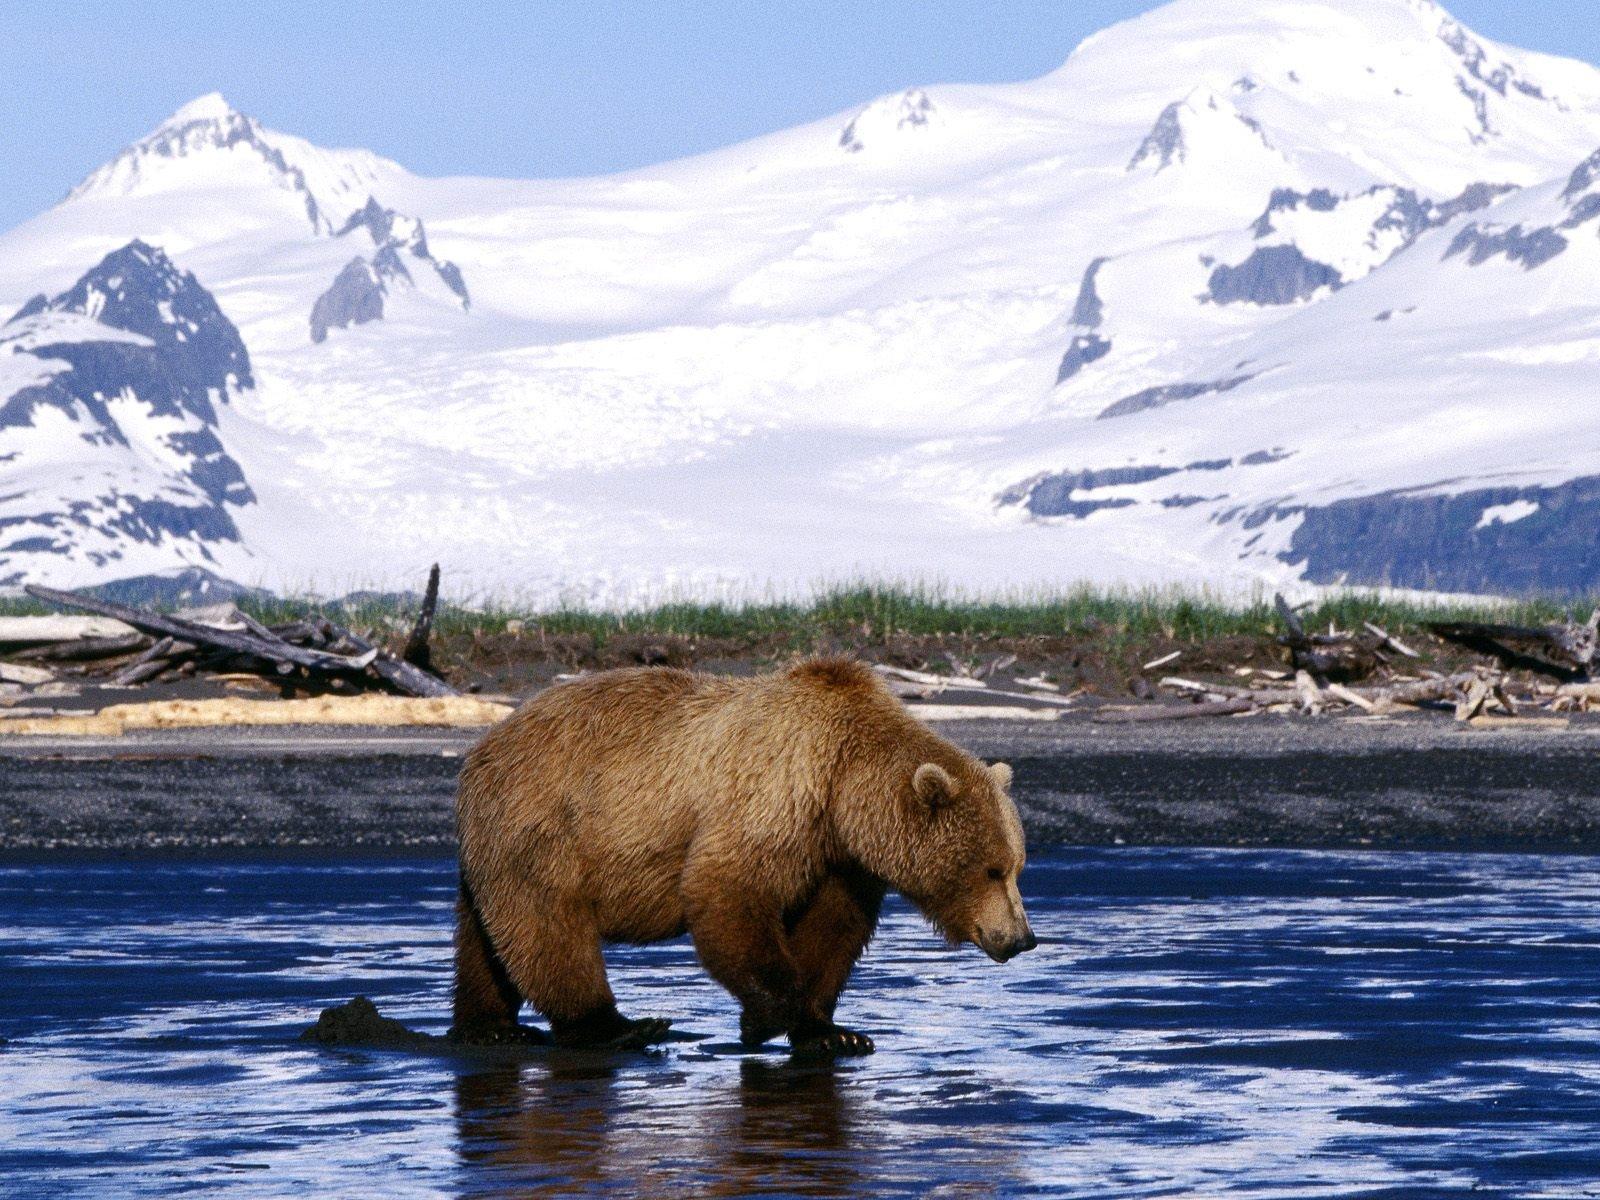 http://3.bp.blogspot.com/-Uhy4U4xR8uI/UXsDnZ0WJgI/AAAAAAAAA10/0kgYOLjKEW4/s1600/The-best-top-desktop-bears-wallpapers-hd-bear-wallpaper-23-brown-bear-fishing.jpg